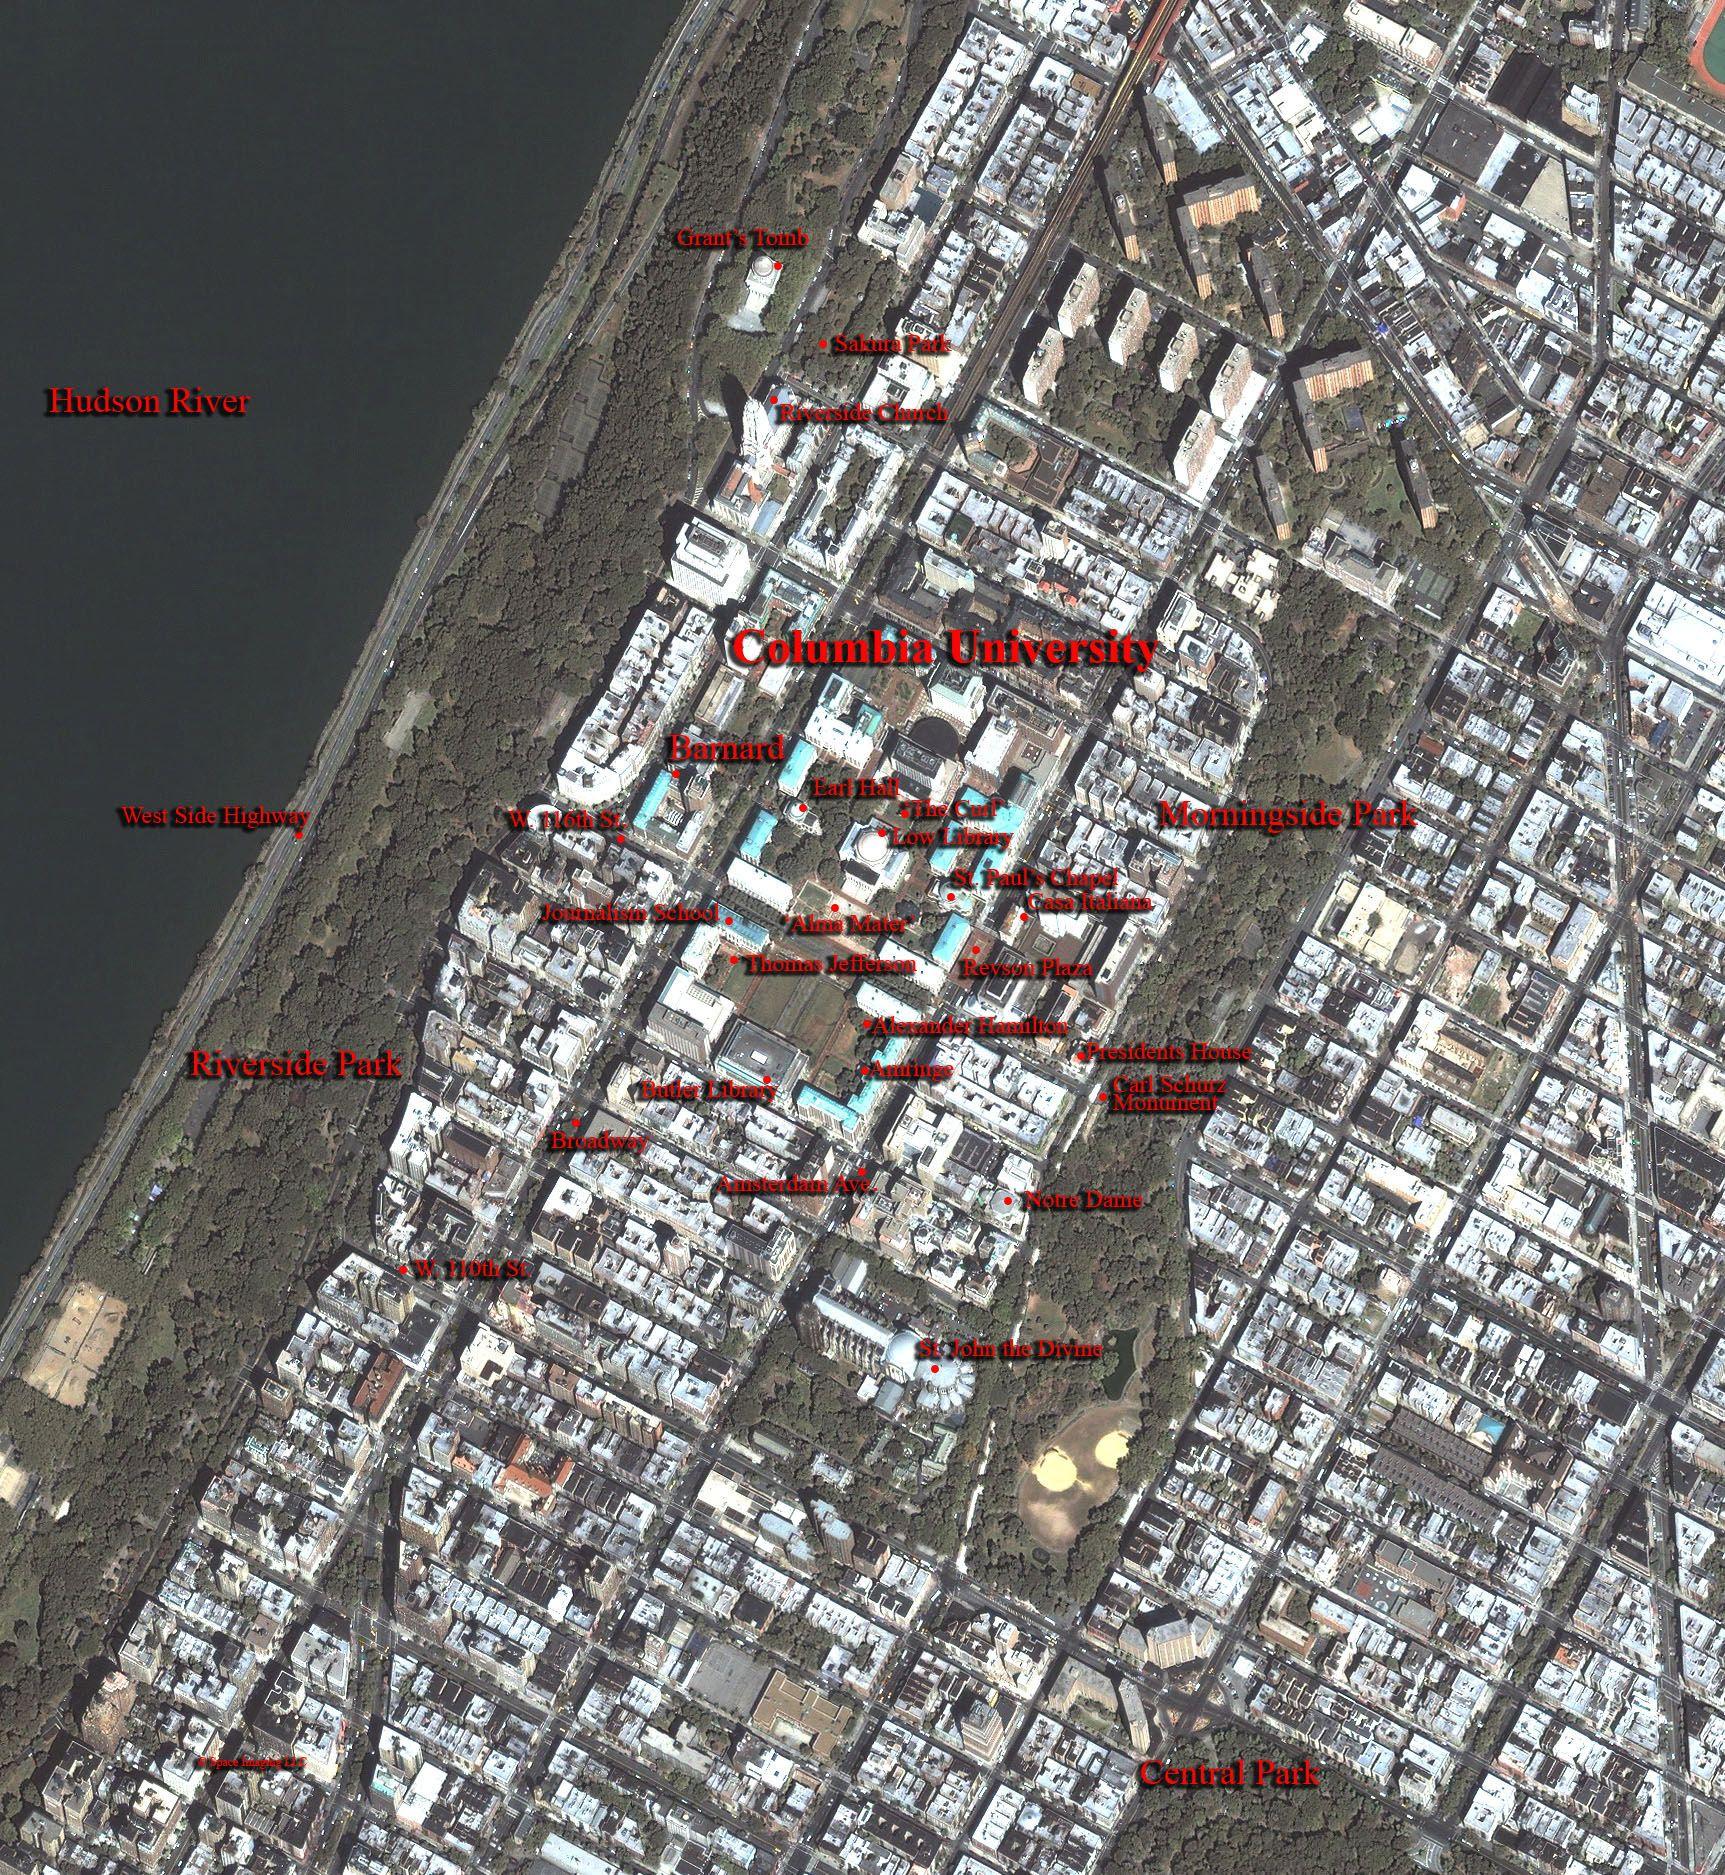 Columbia University and vicinity